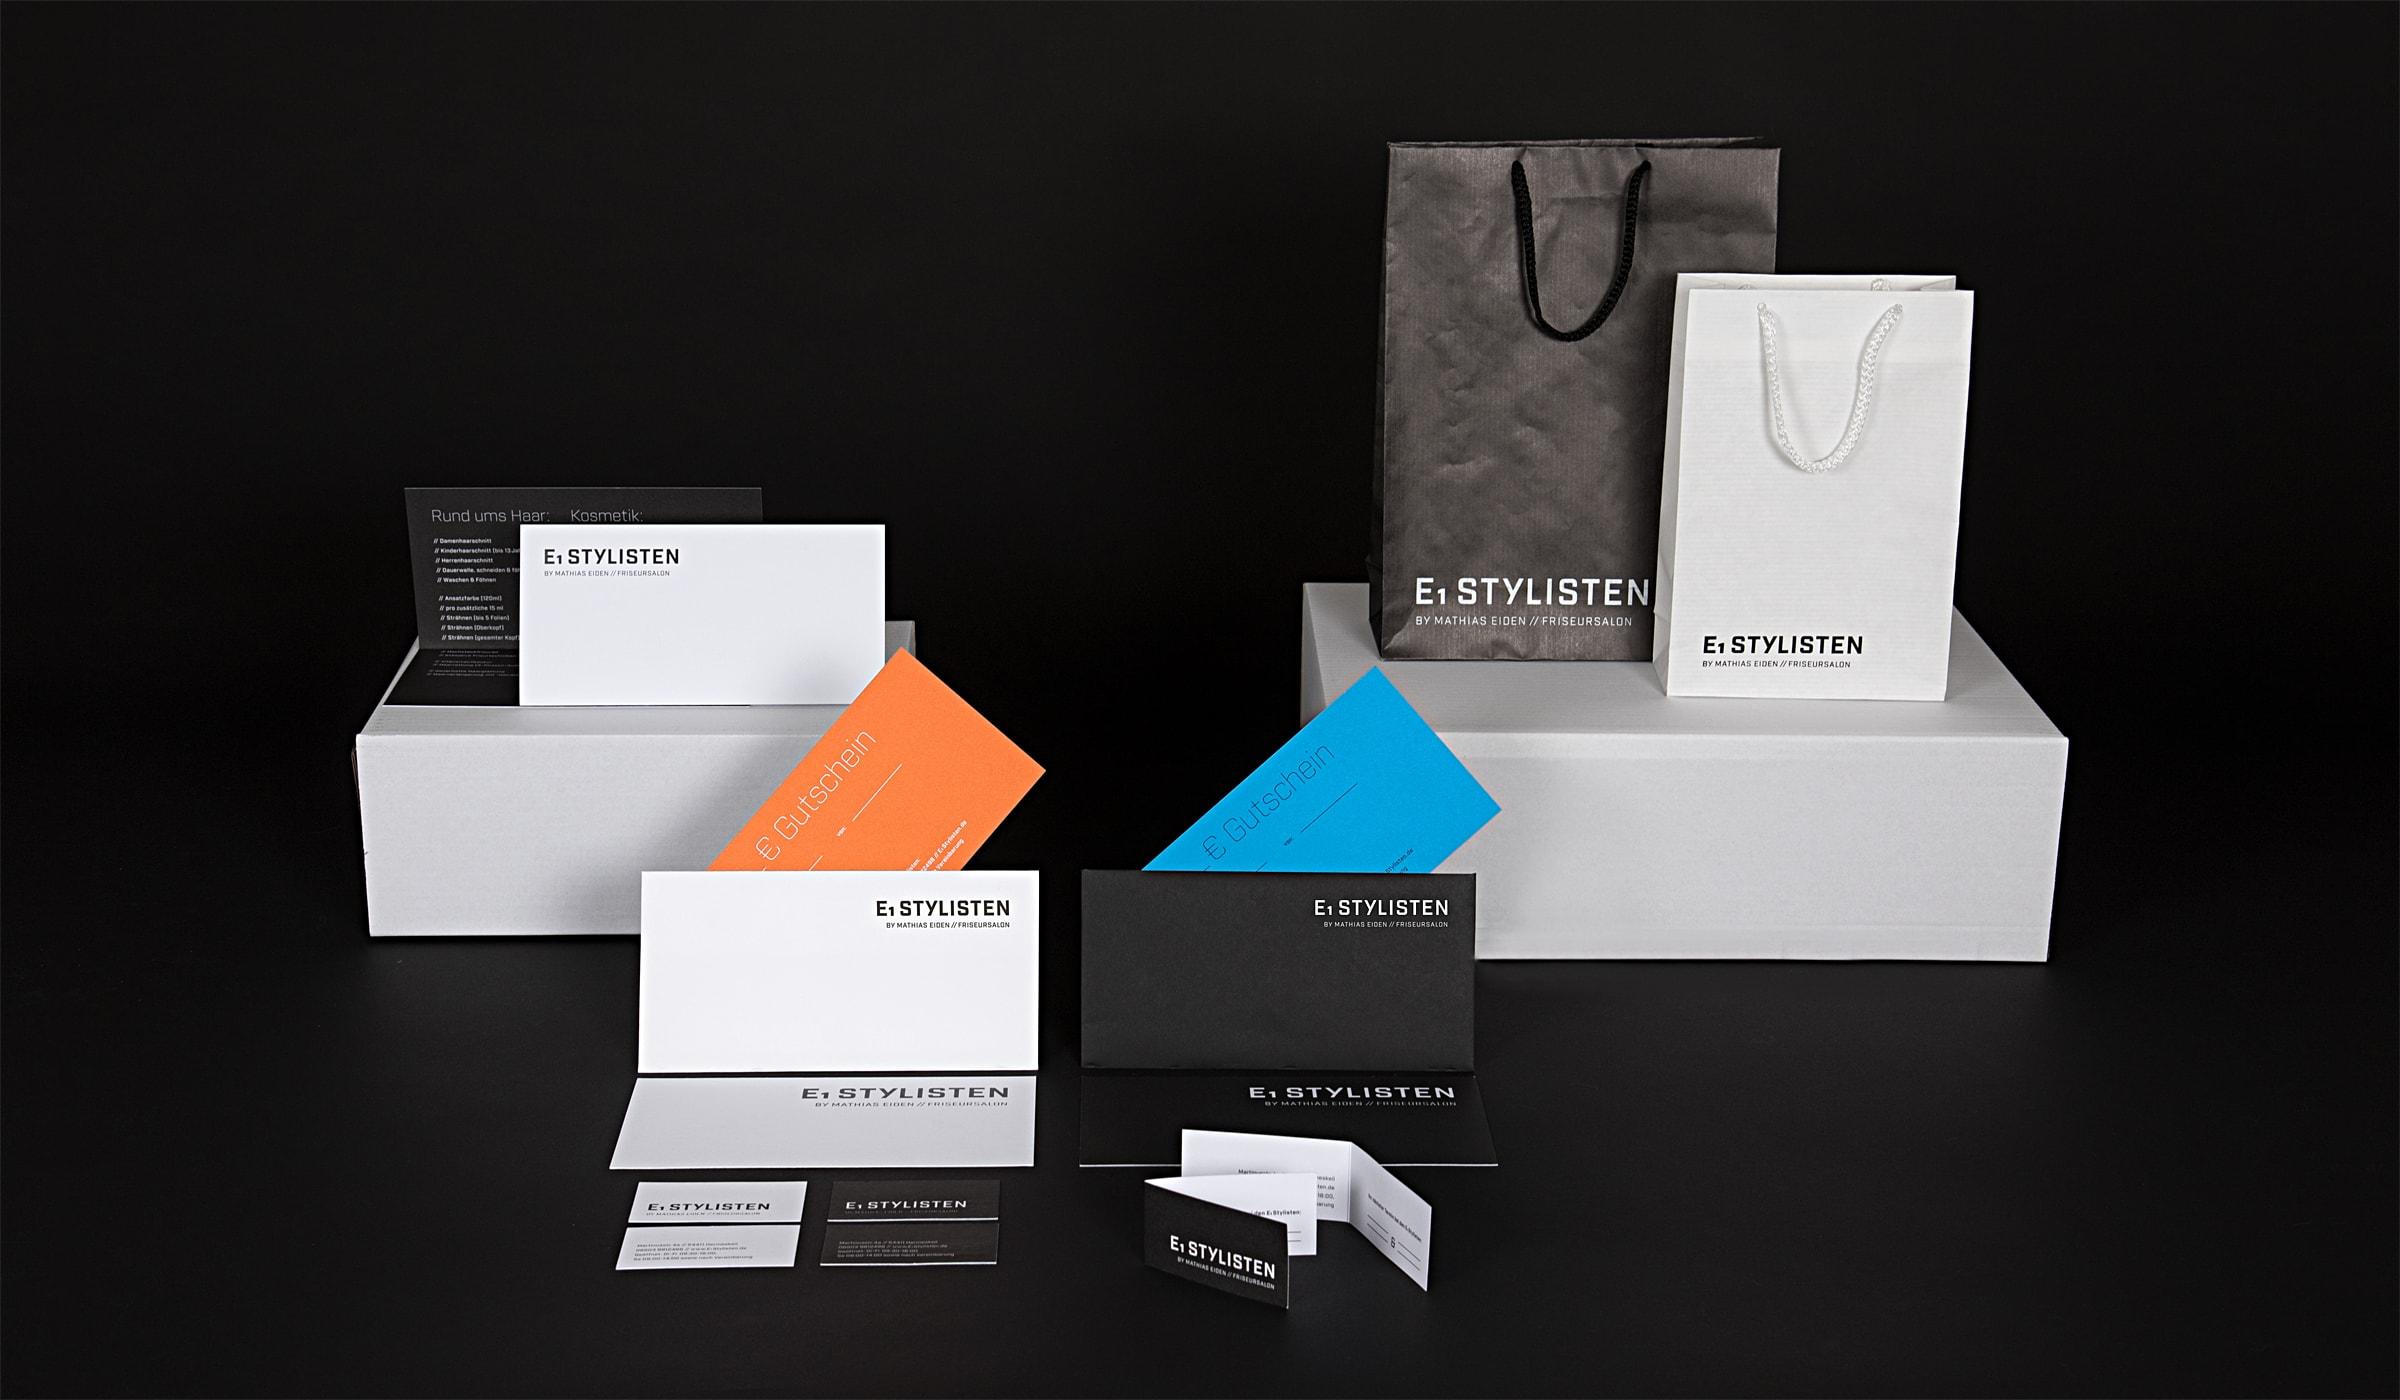 Konzeptarbeit ~ Corporate Design // Corporate Design // E1 Stylisten